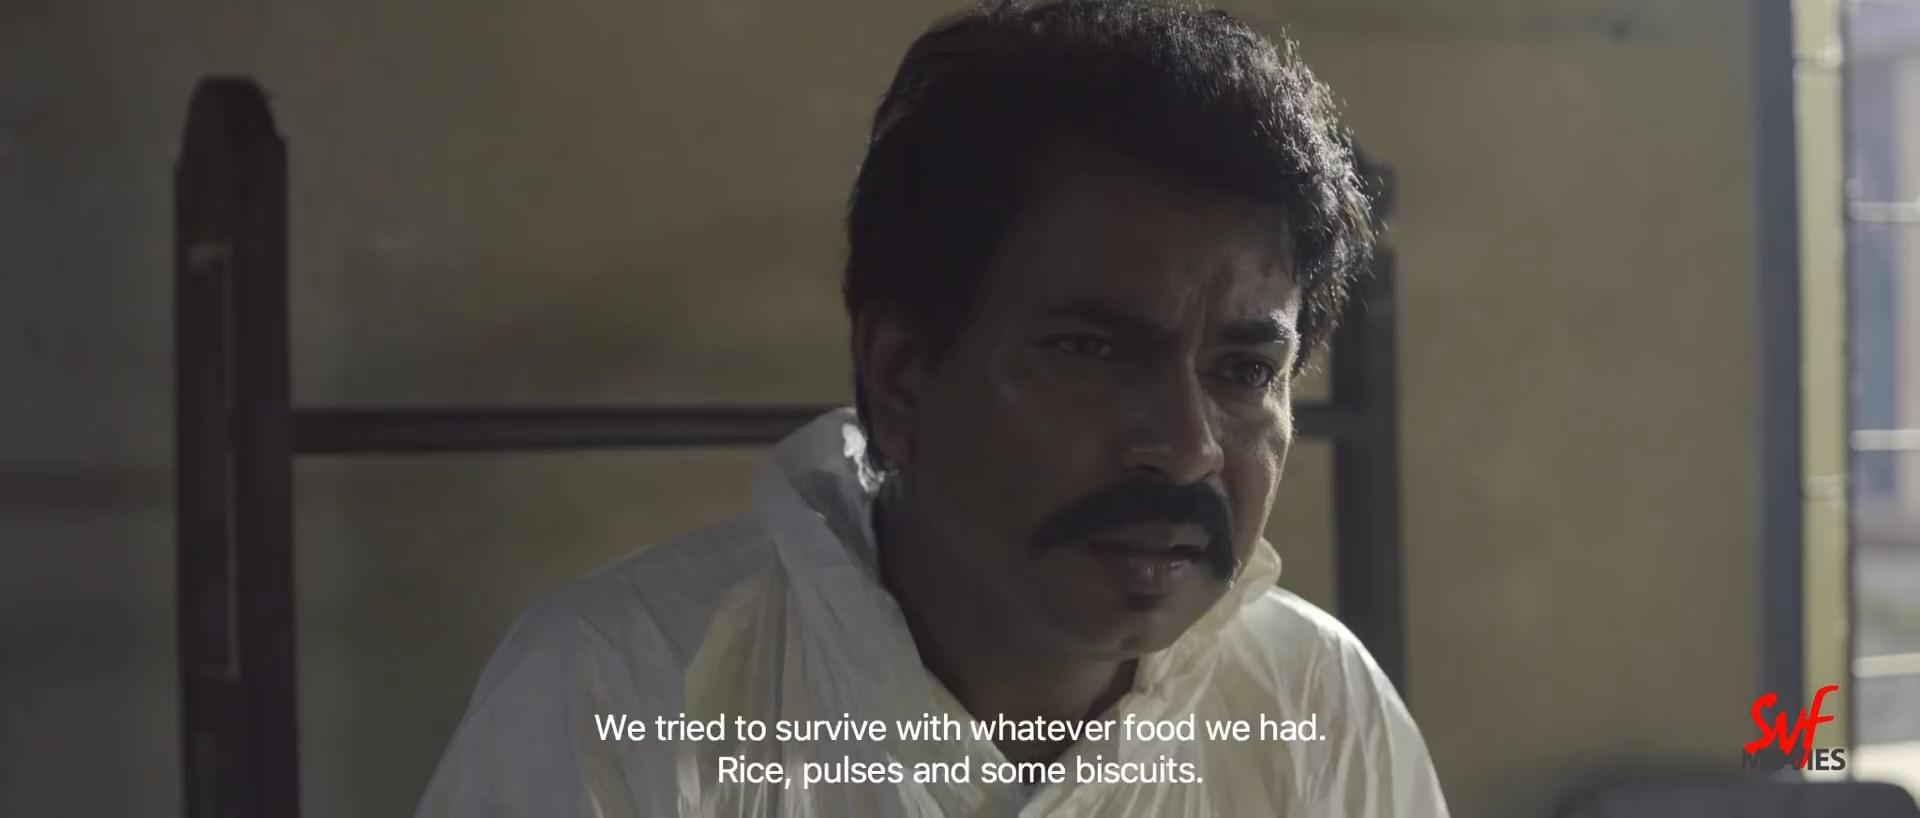 Zombiesthaan 2021 Full Bengali Film.mp4 snapshot 00.16.47.208